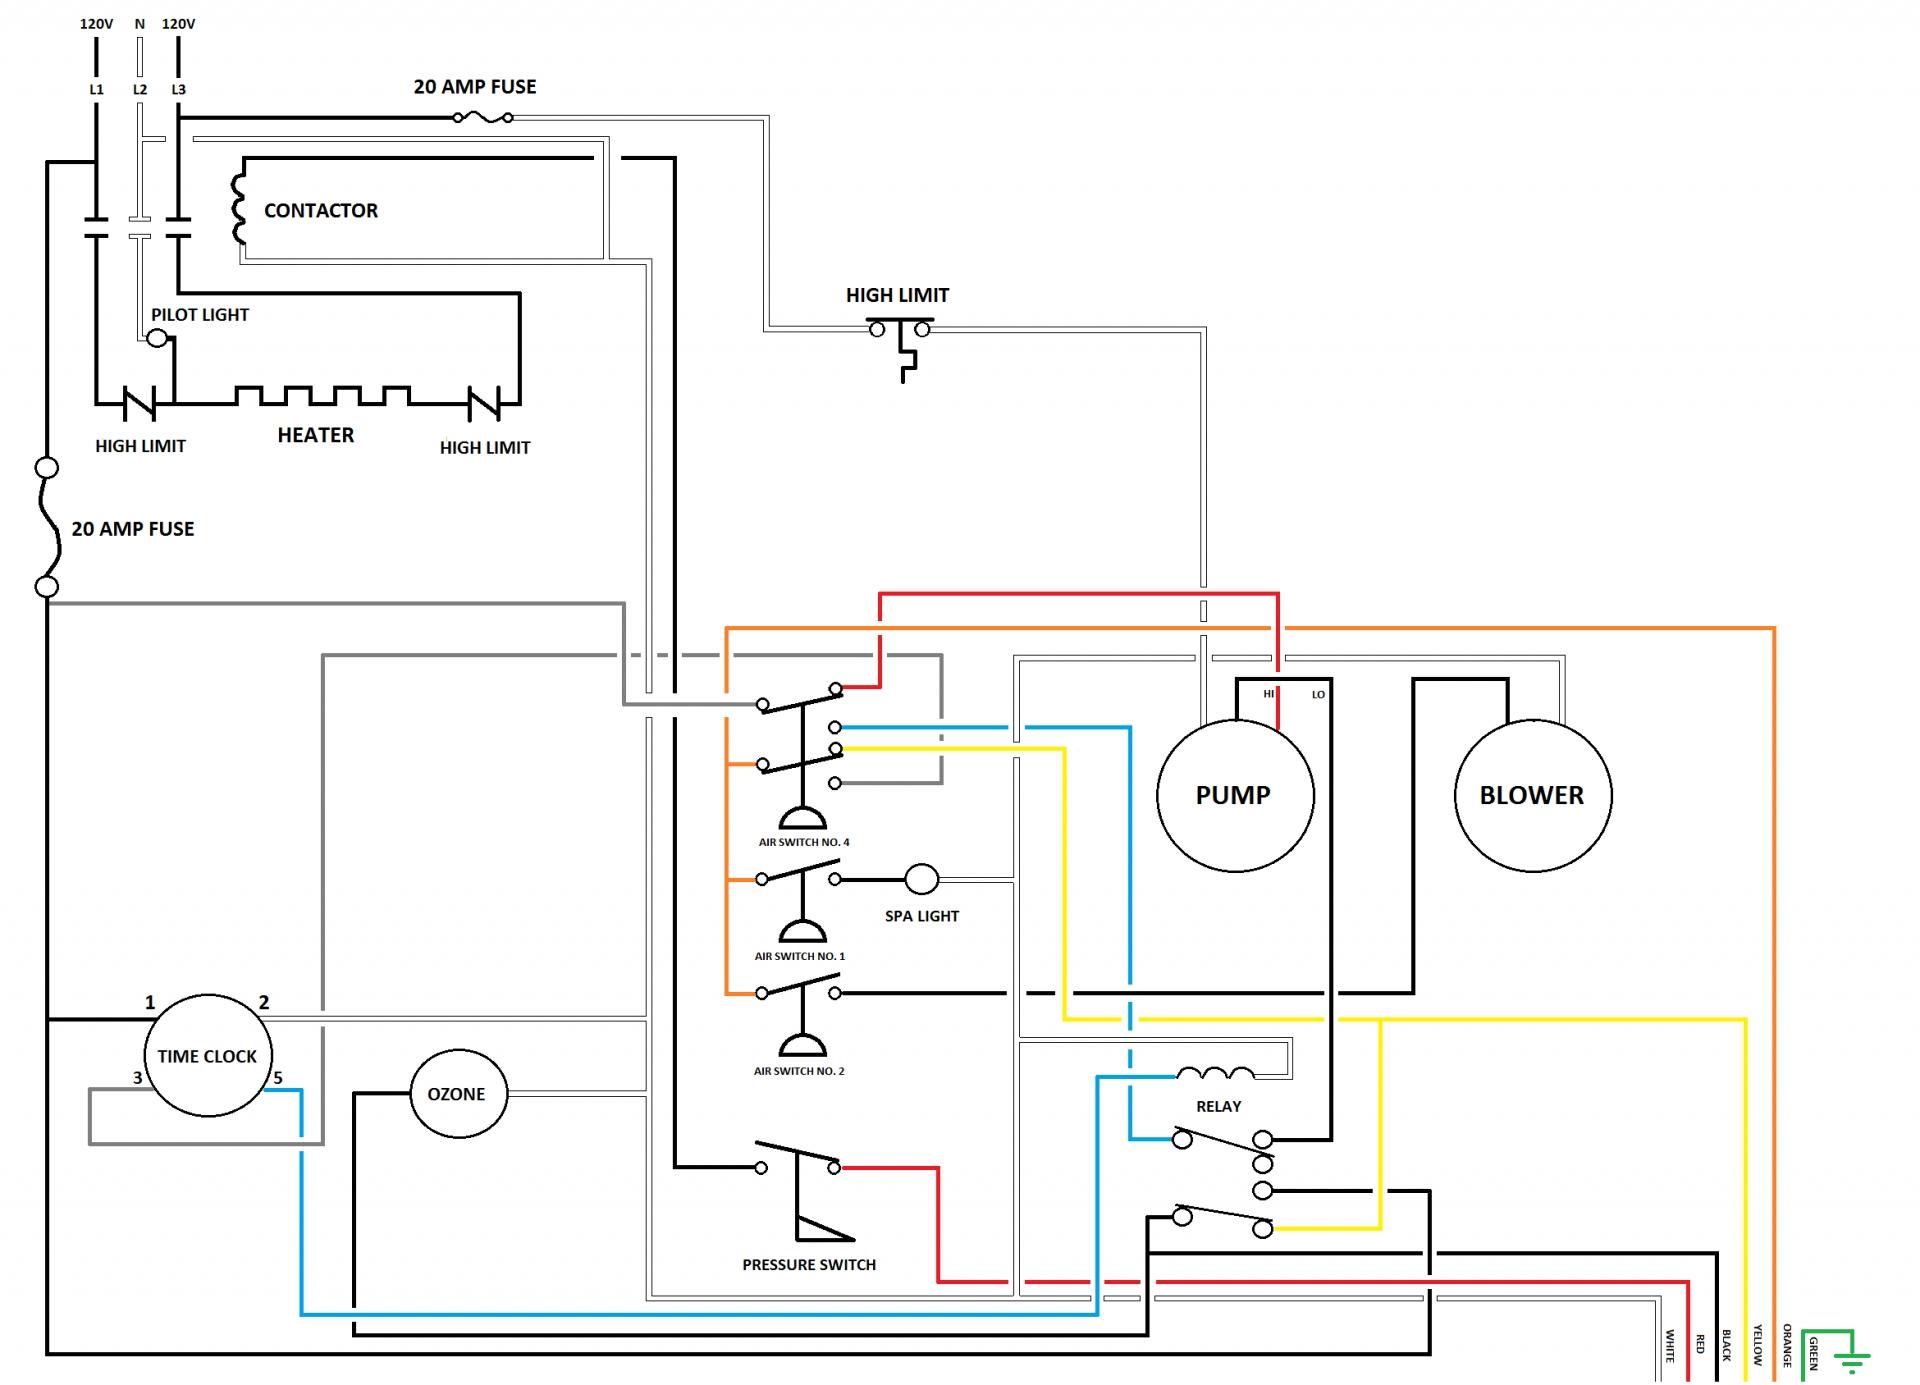 square d hot tub gfci breaker wiring diagram free wiring diagram